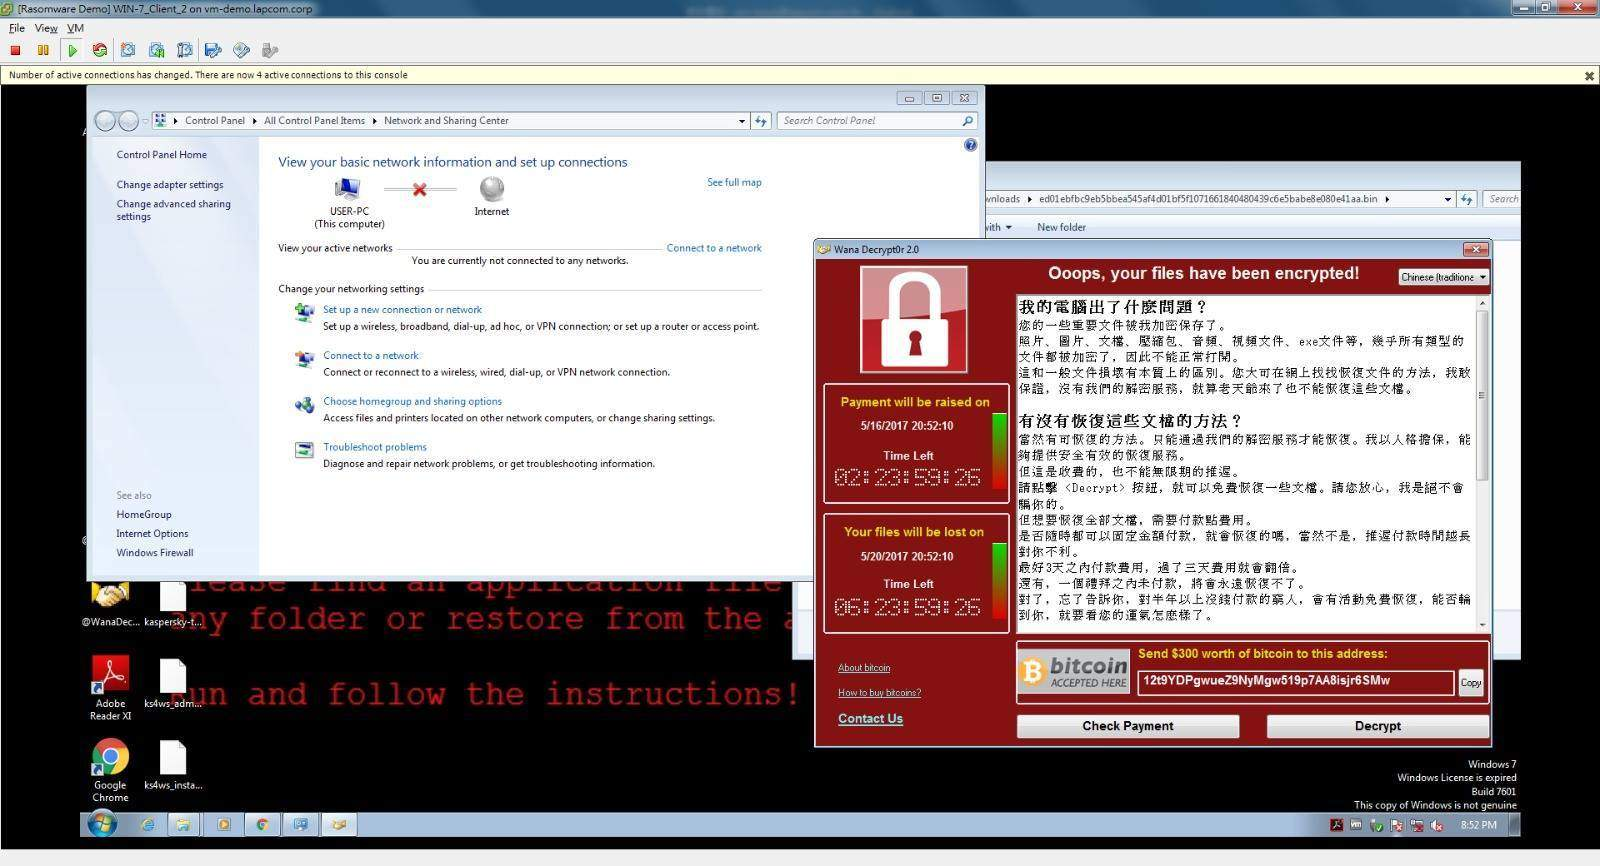 Wanna Decrytor / WannaCry / Wcry 勒索病毒影響全球 : Windows 香港受害者上升中 (附:預防 刪除 修復方法)